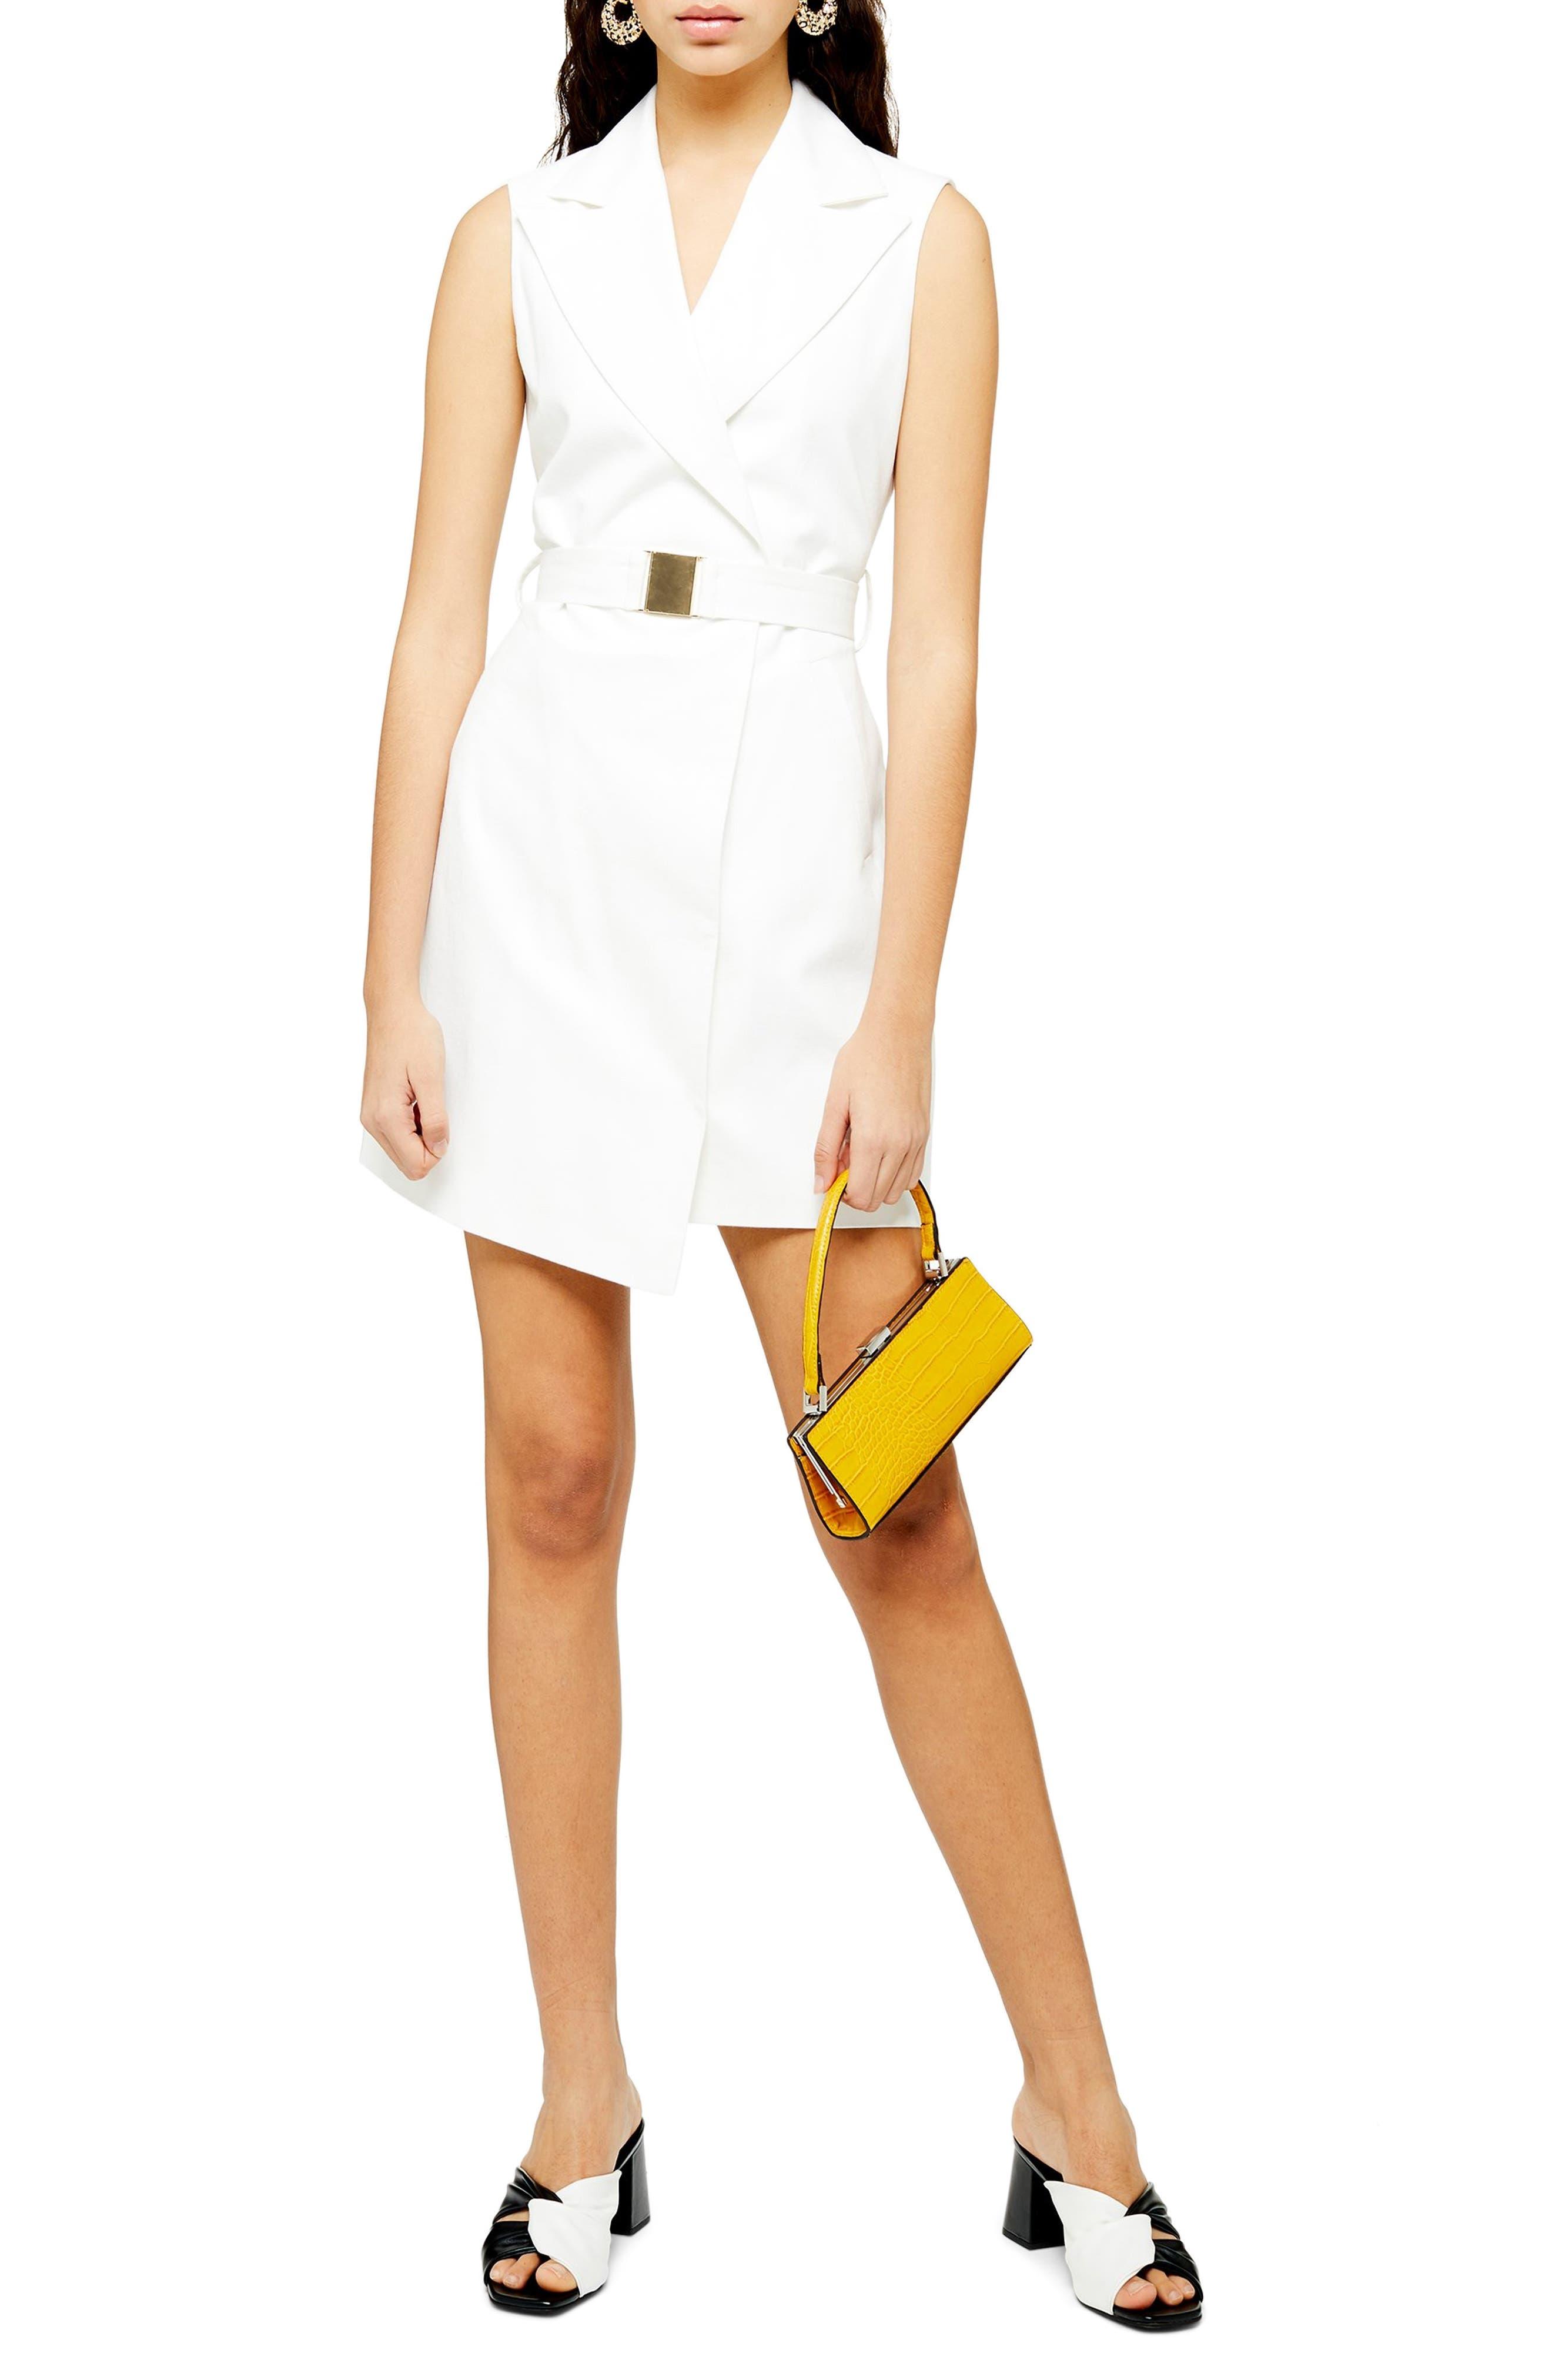 Topshop Belted Sleeveless Blazer Dress, US (fits like 2-4) - Ivory